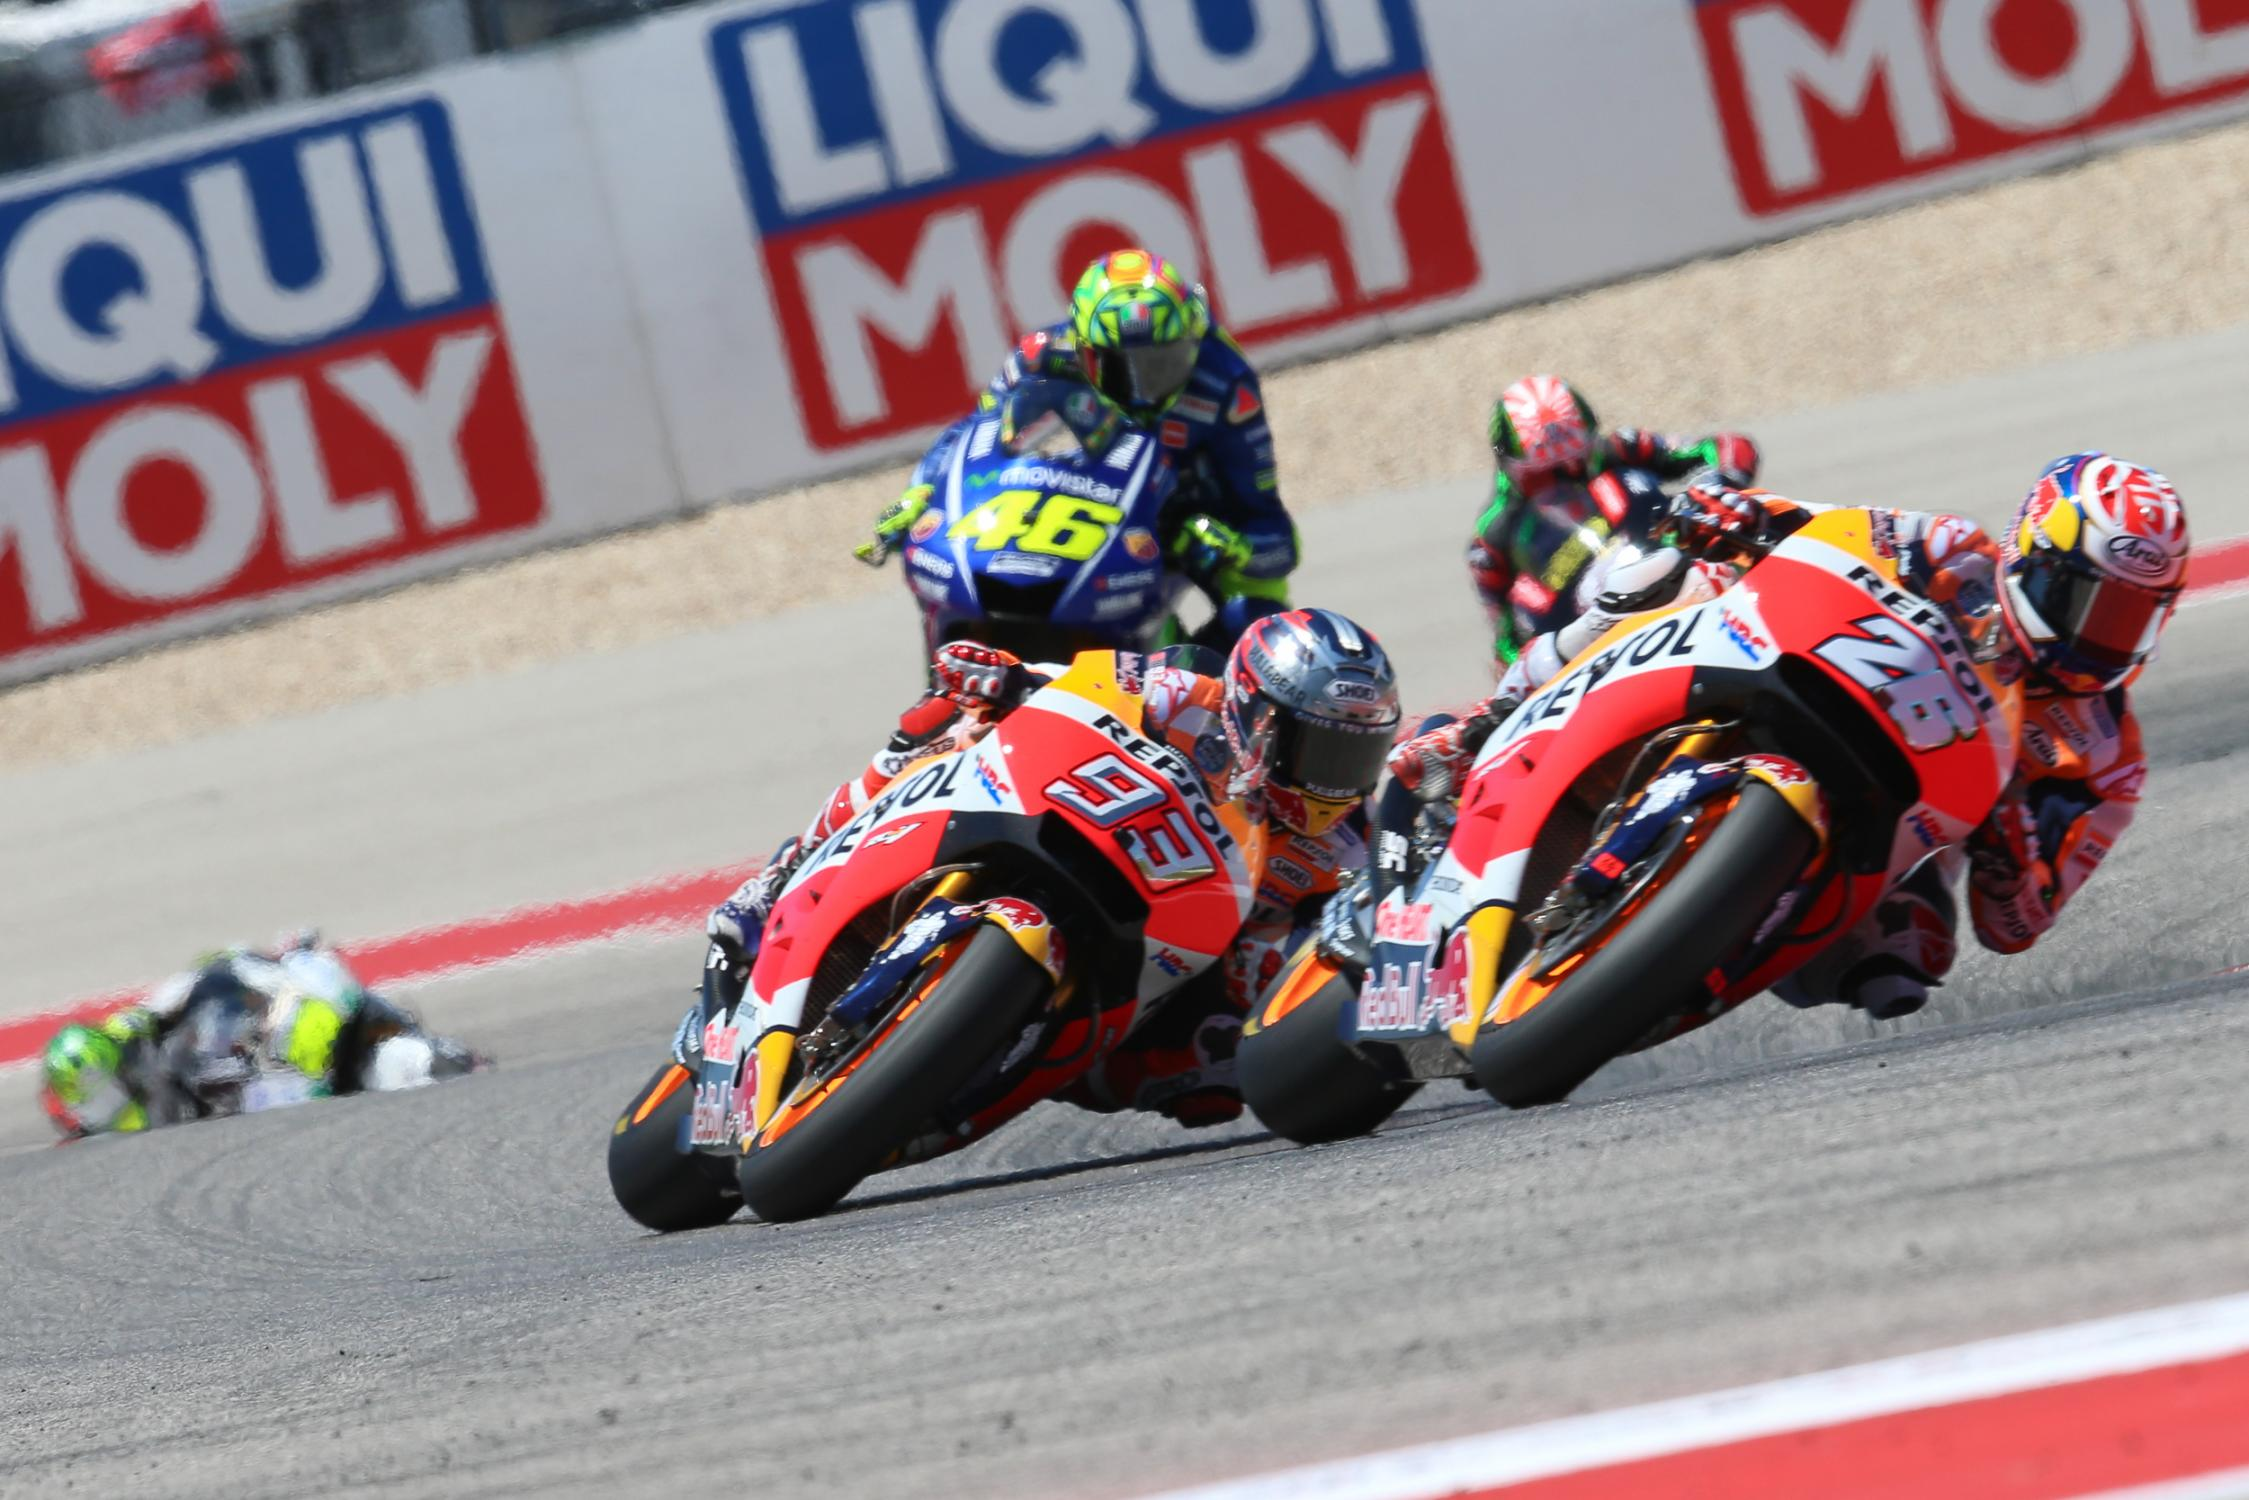 [MotoGP] Austin 26-dani-pedrosa-espbl1_2672.gallery_full_top_fullscreen